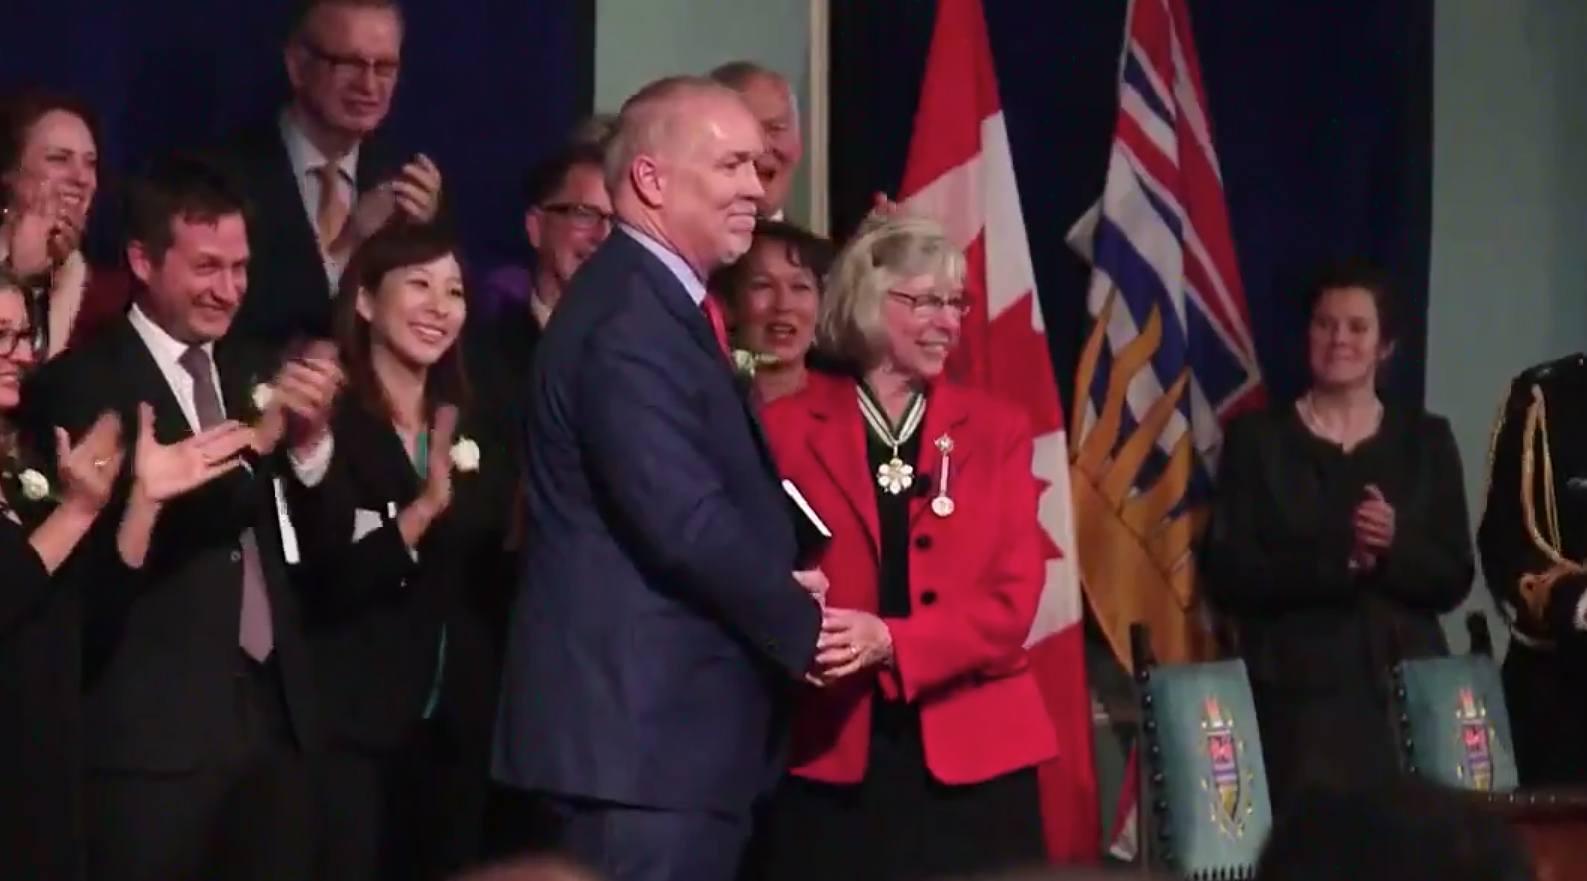 New BC Premier John Horgan being sworn in by Lieutenant Governor Judith Guichon (John Horgan/Facebook)